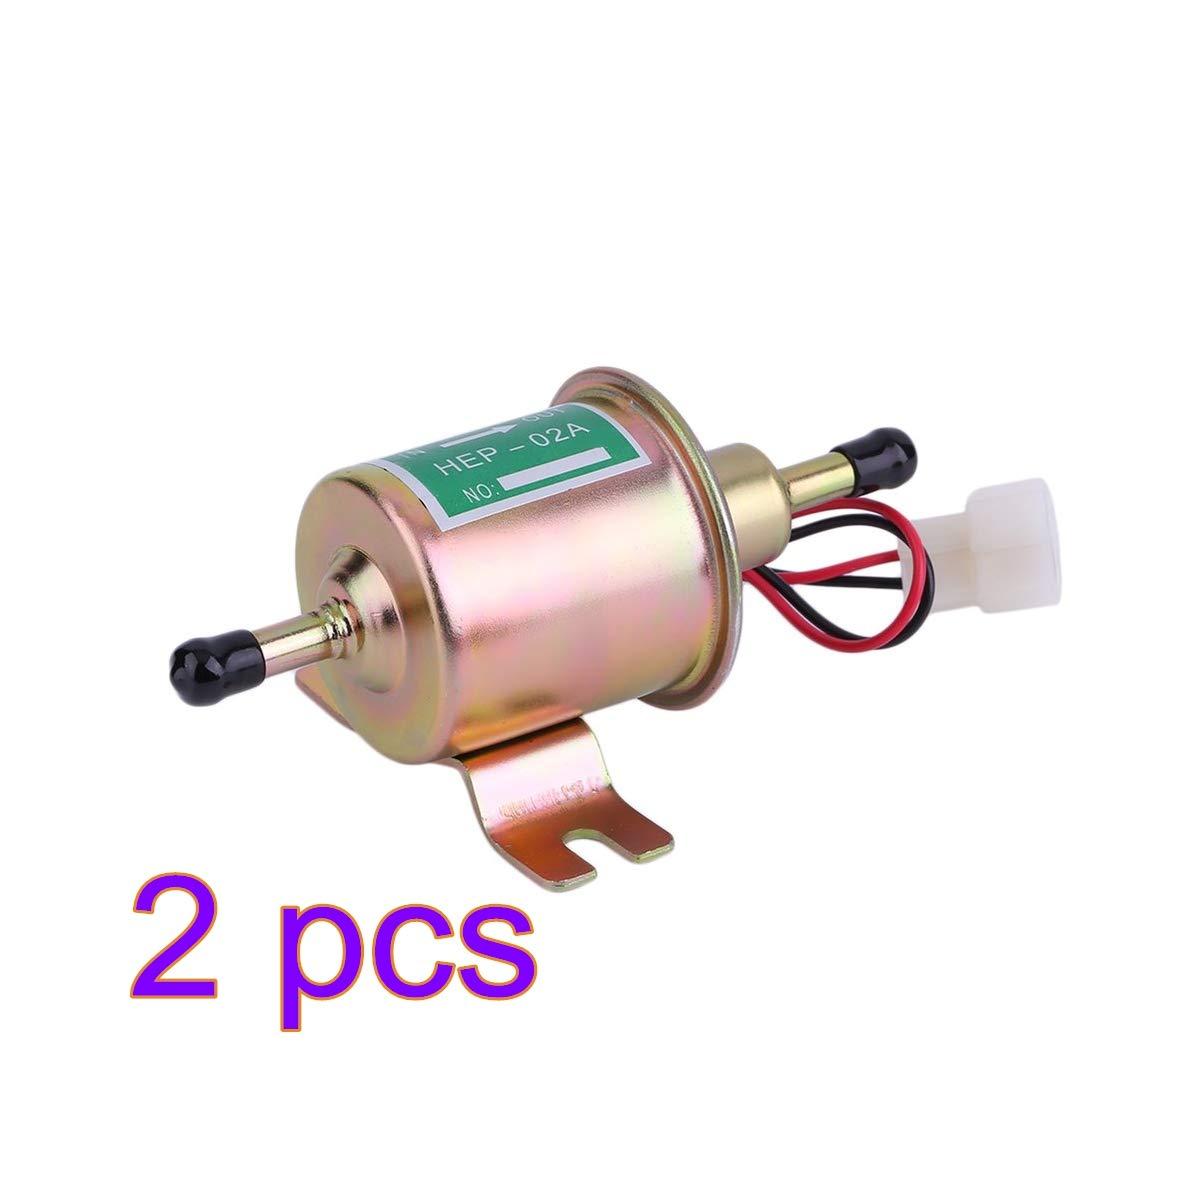 aceite de la bomba de combustible del coche en l/ínea universal del gas 12V para los motores diesel de la gasolina Bomba de combustible el/éctrica 2pcs